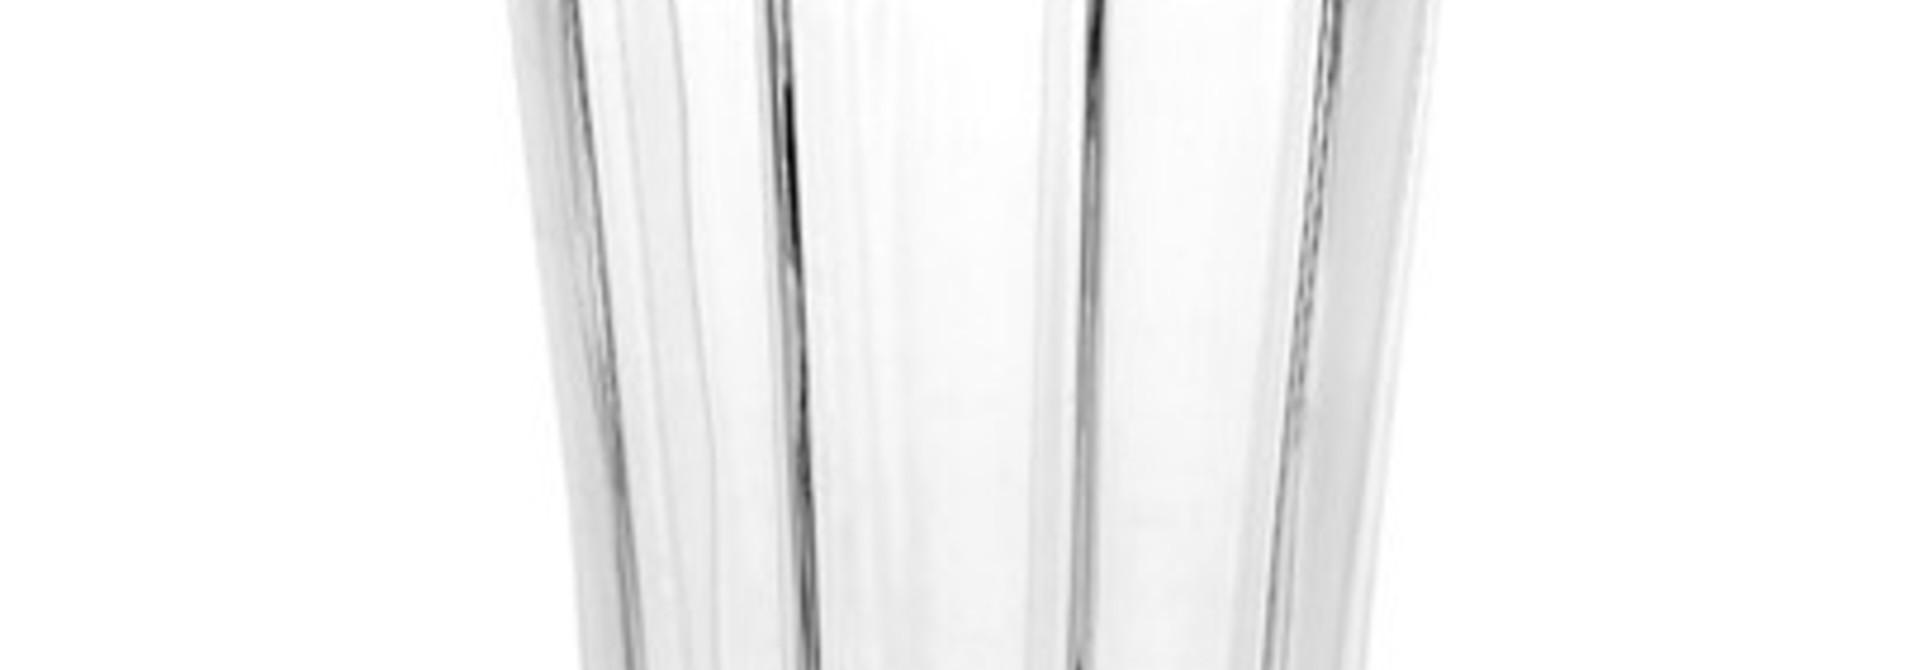 Short Tumbler - Water Glass